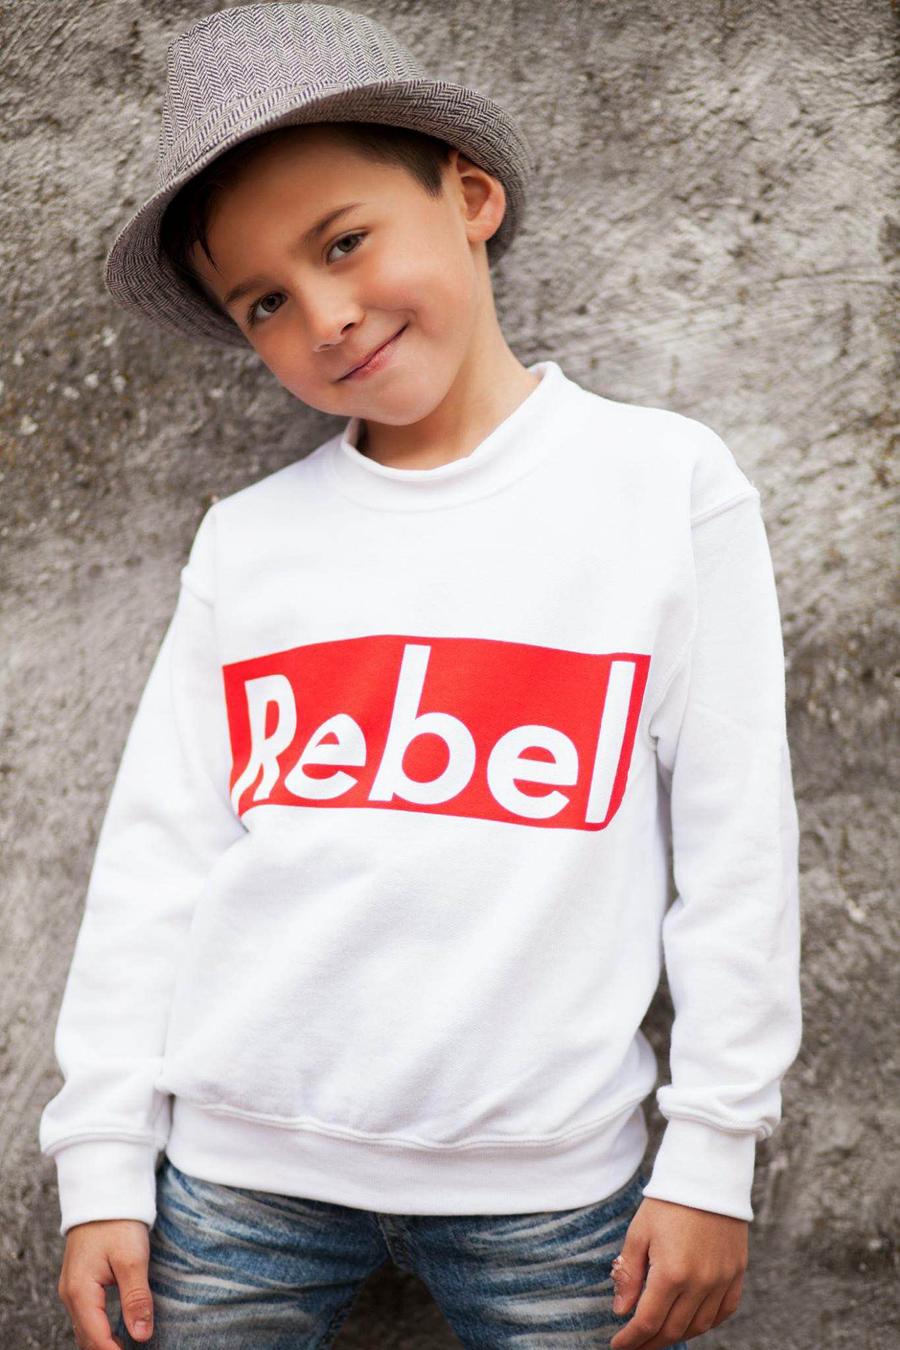 Jongenskleding, Rebel sweater, Colourful Rebel, kindermodeblog, kinderkleding review, boyslabel